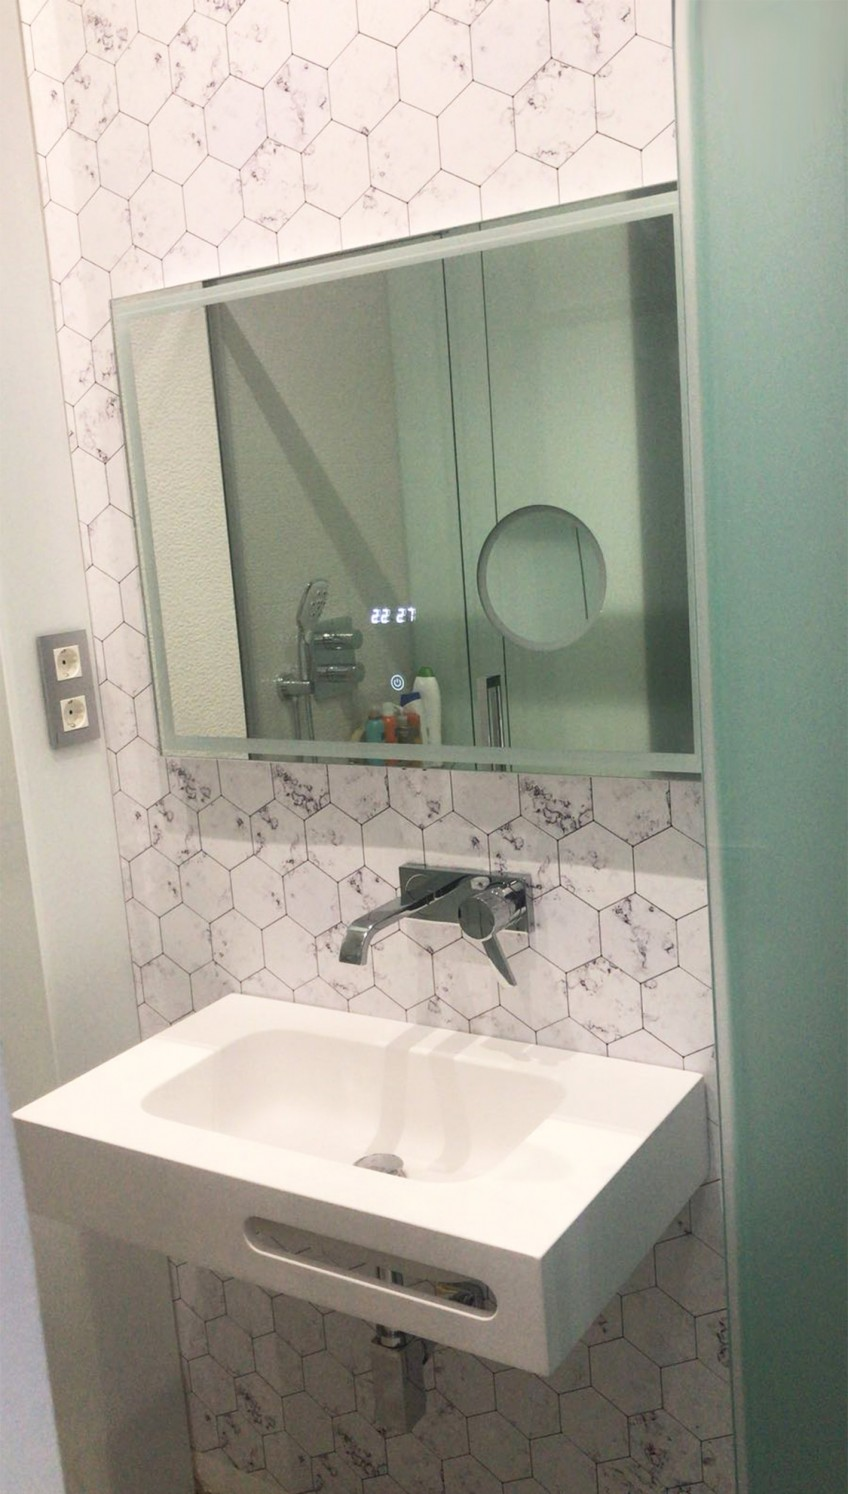 pared-de-bano-forrada-con-vinilo-hexagonos-de-marmol-mini-lokoloko-design